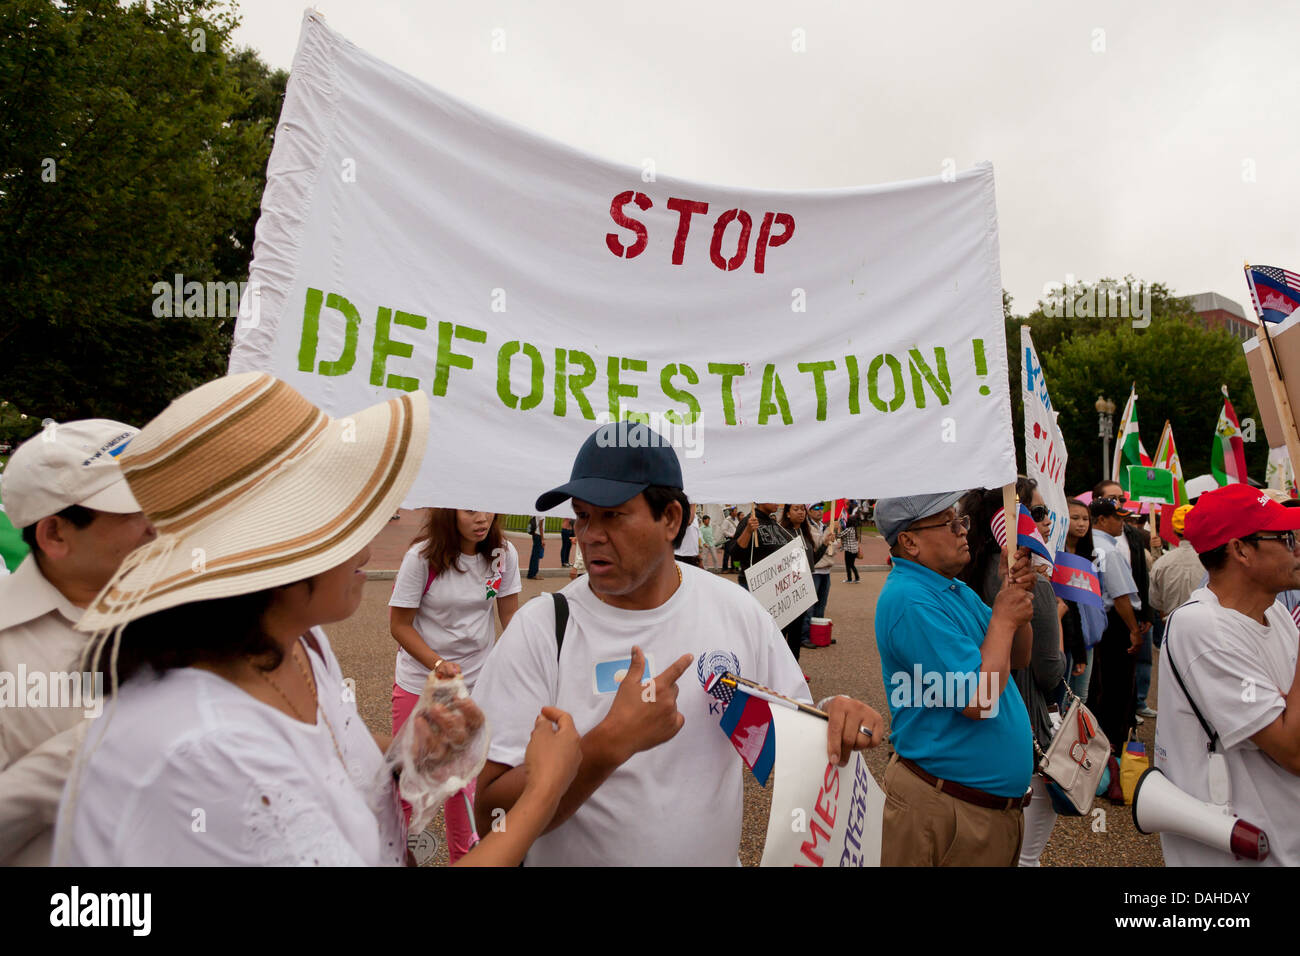 Stop deforestation banner at an environmental rally - Stock Image